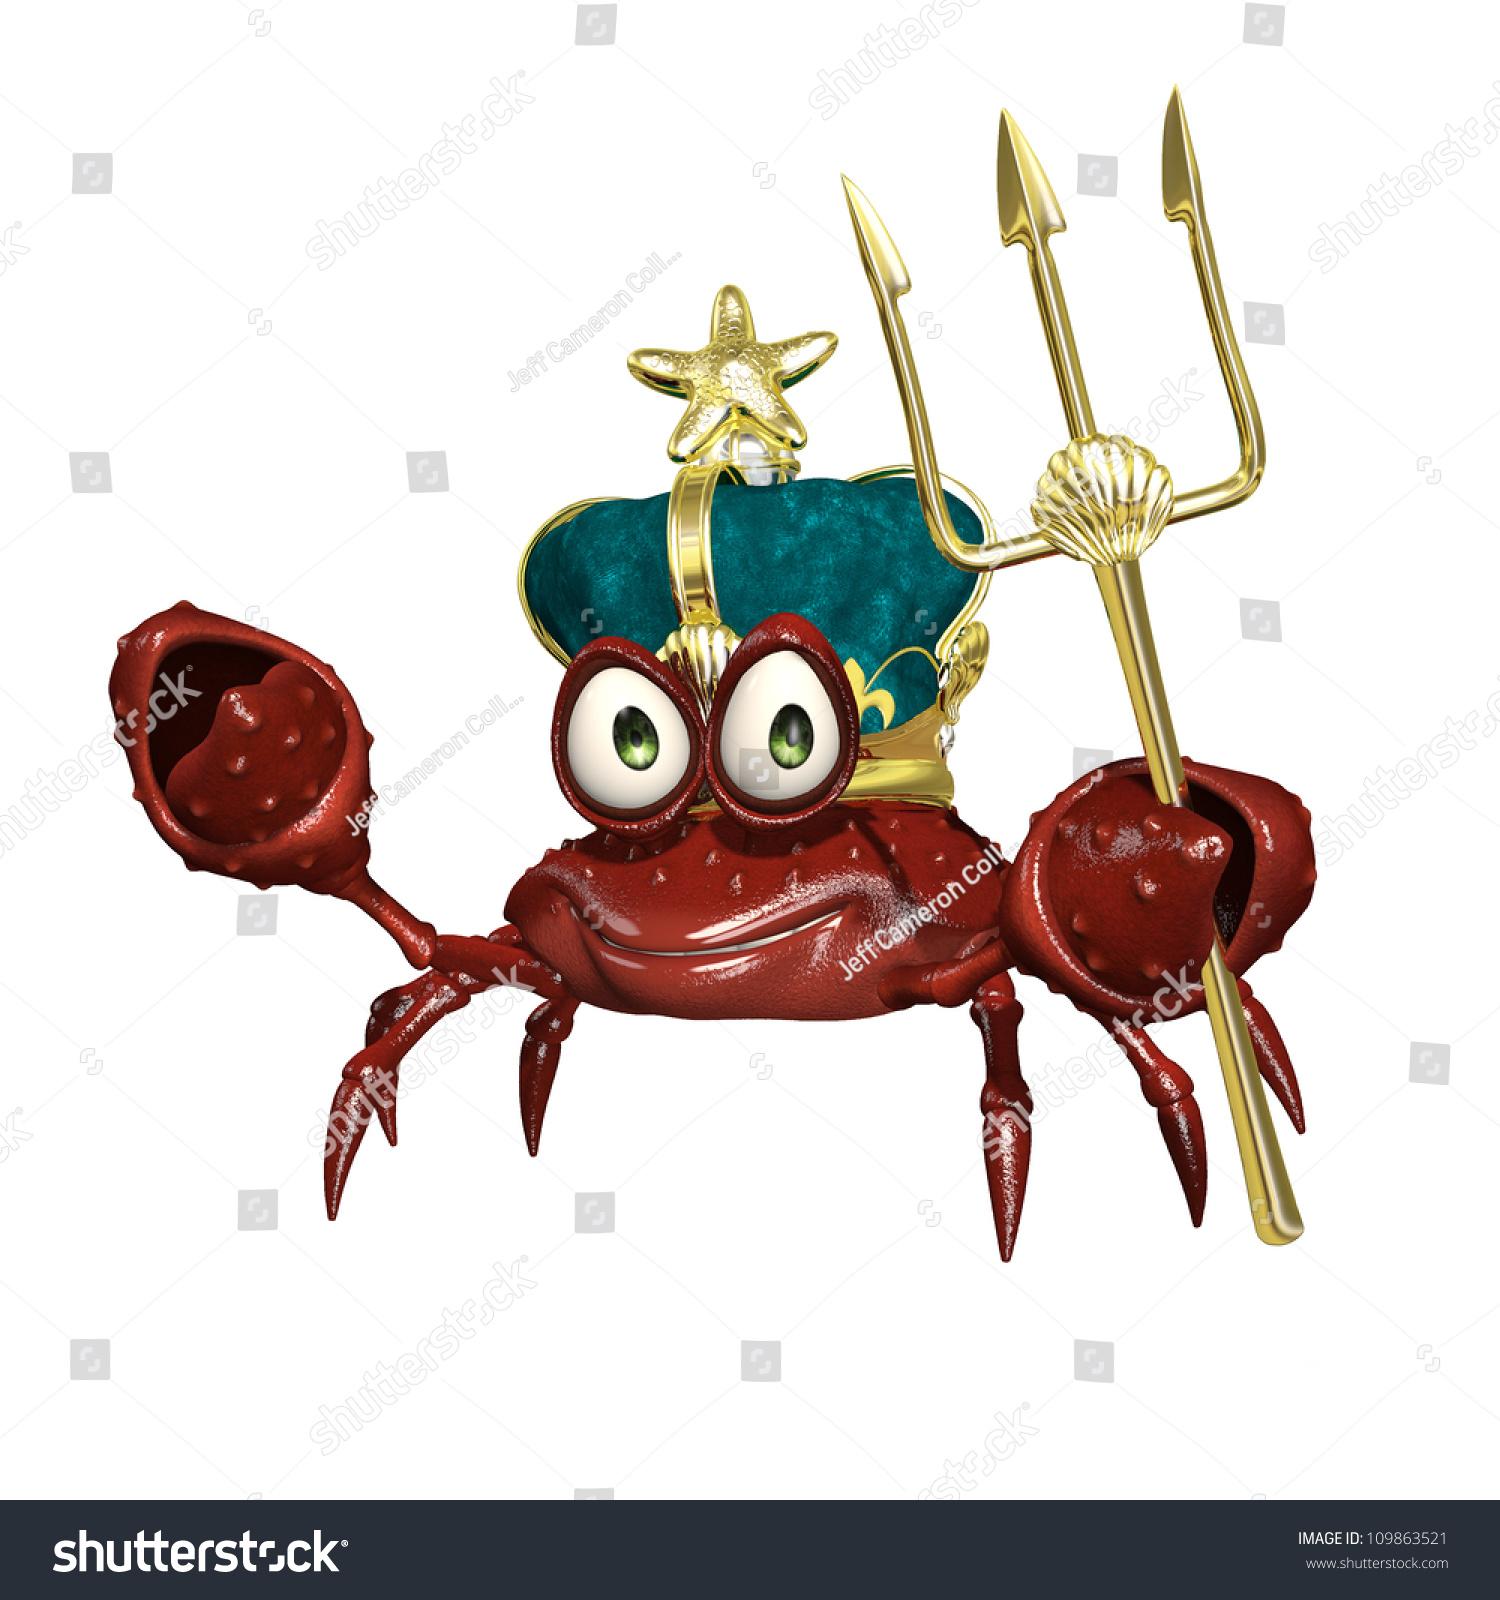 king crab clipart - photo #10